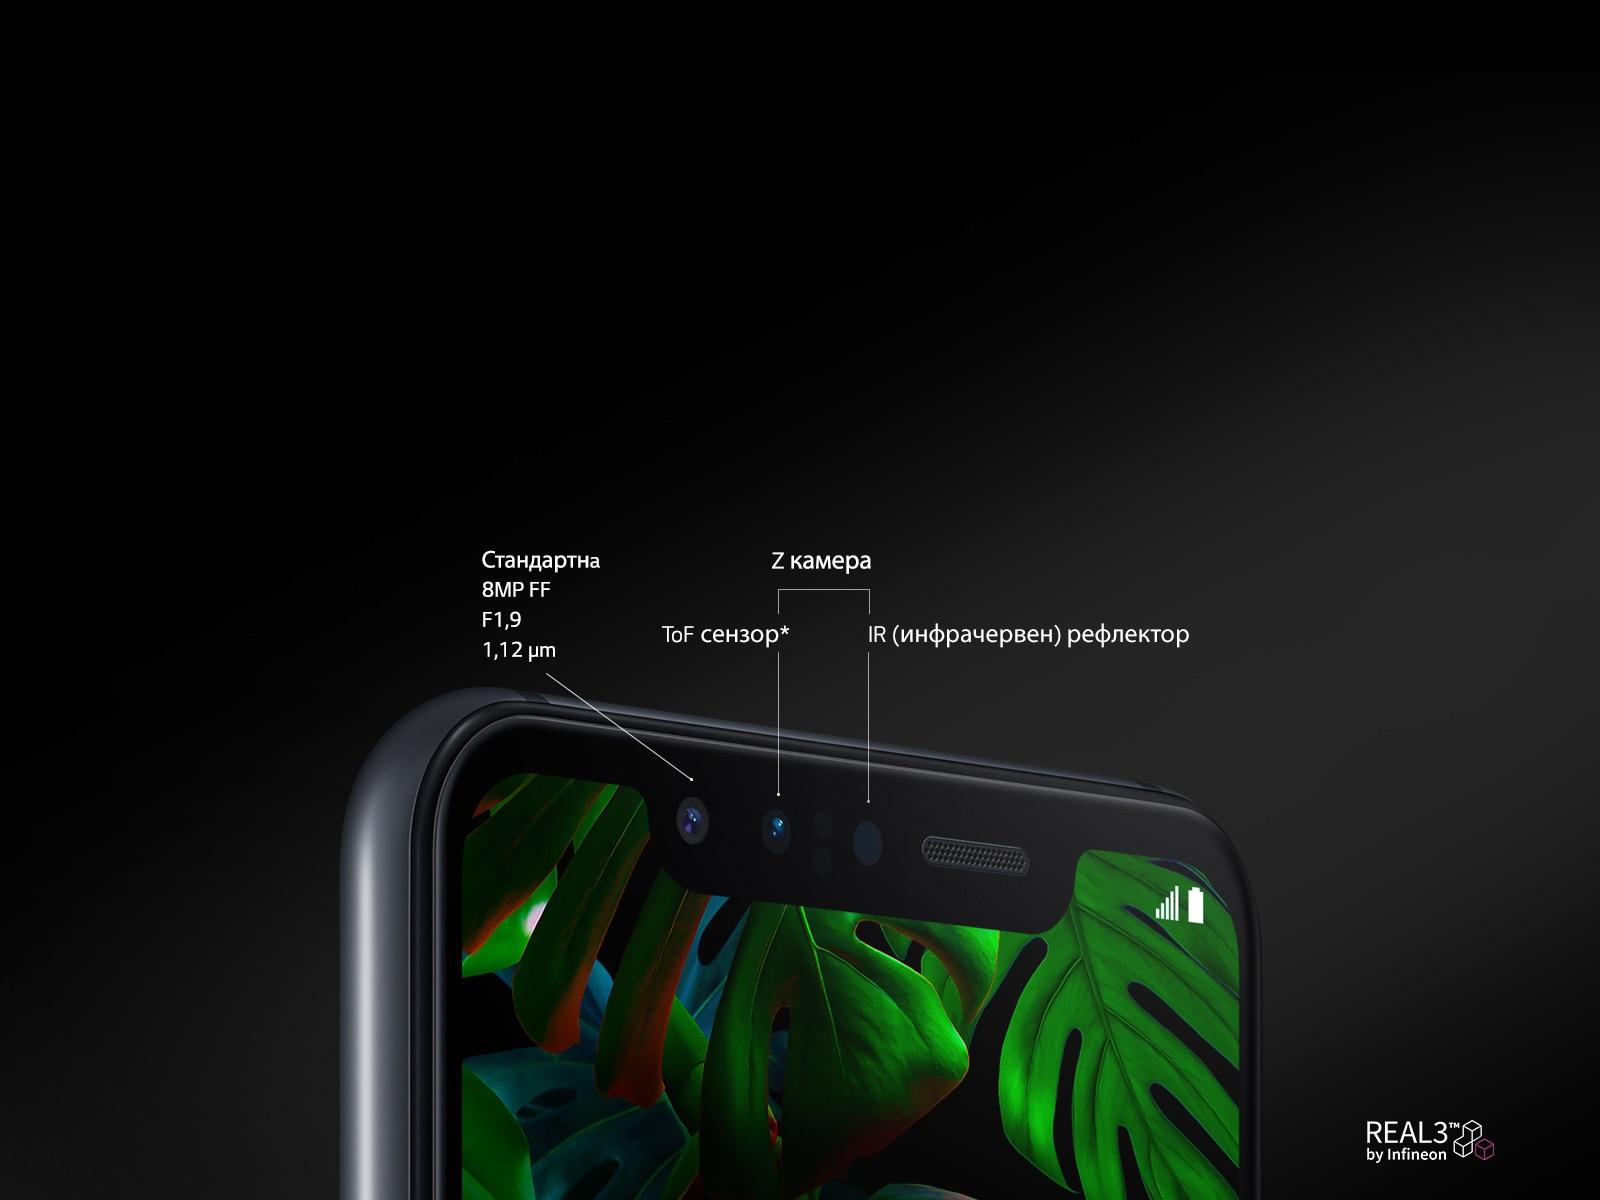 MC-G8SThinQ-MirrorBlack-02-Z-Camera-Desktop1